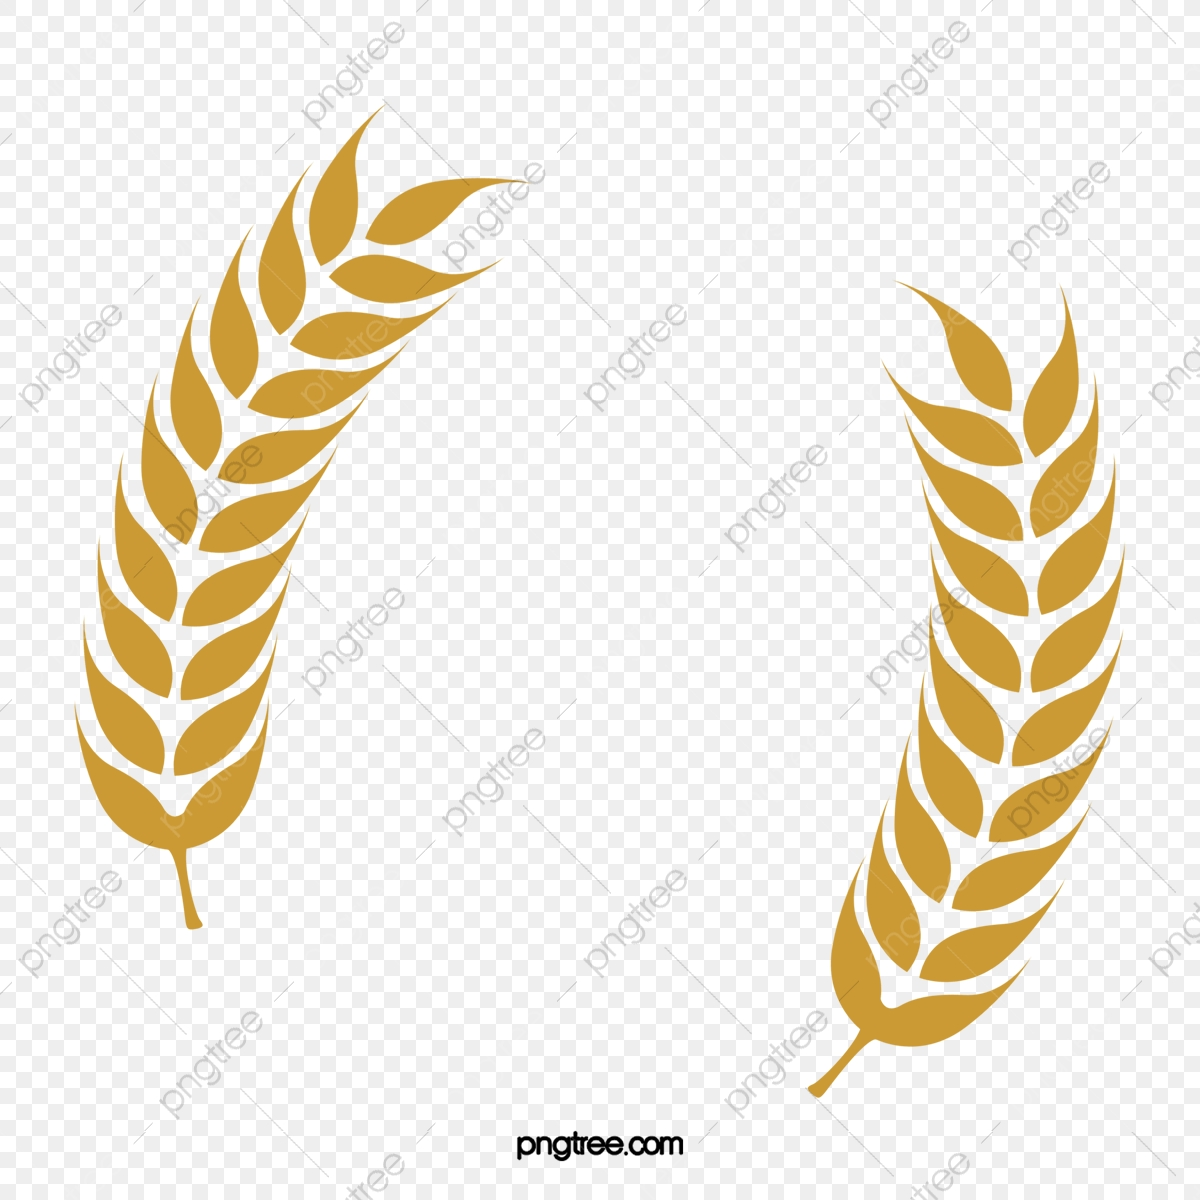 Wheat clipart paddy. Rice barley